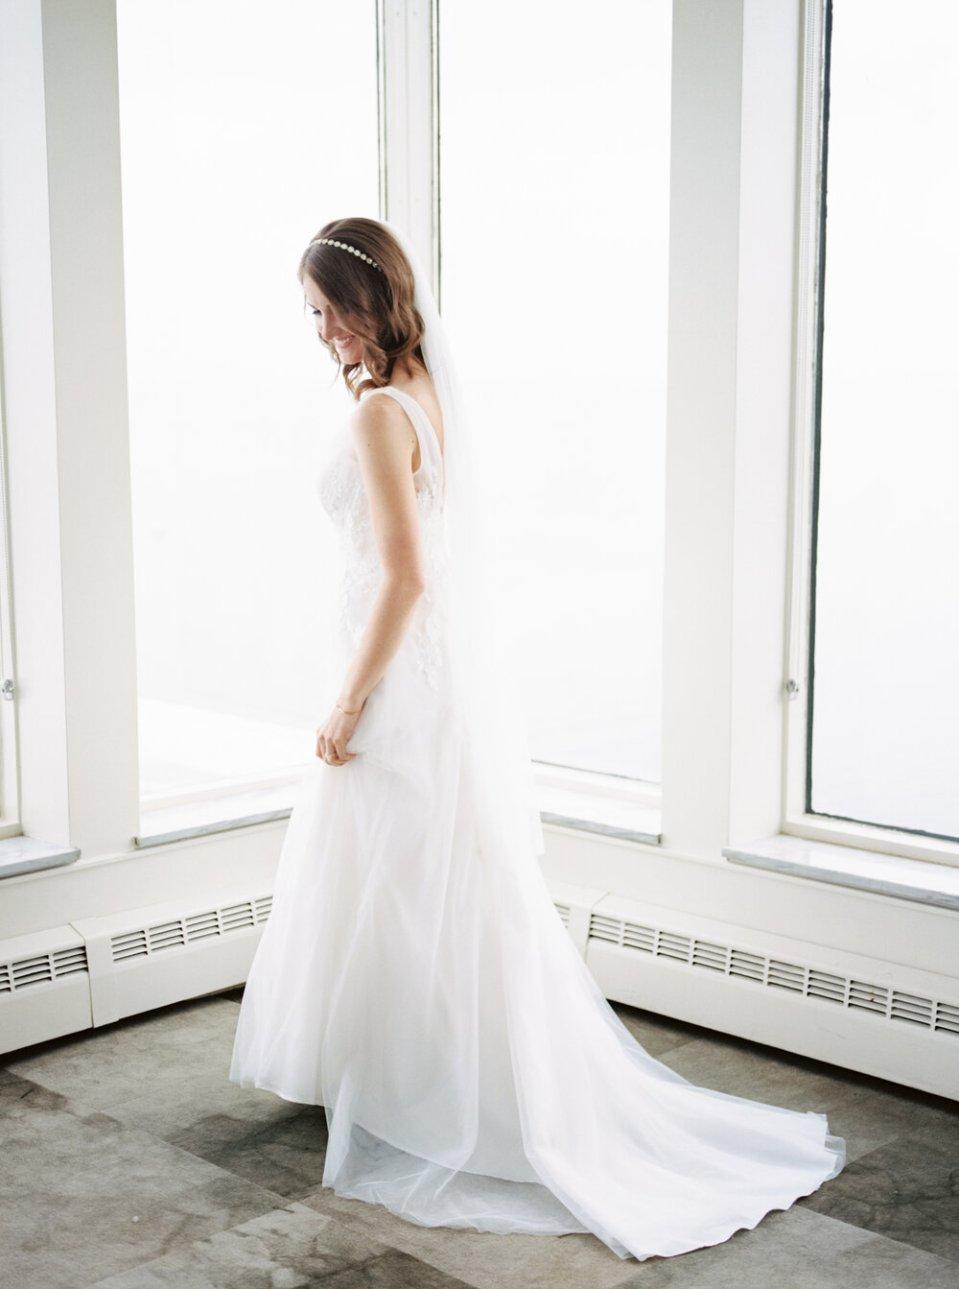 full-classic-romantic-cleveland-wedding-by-matt-erickson-photography-64.JPG